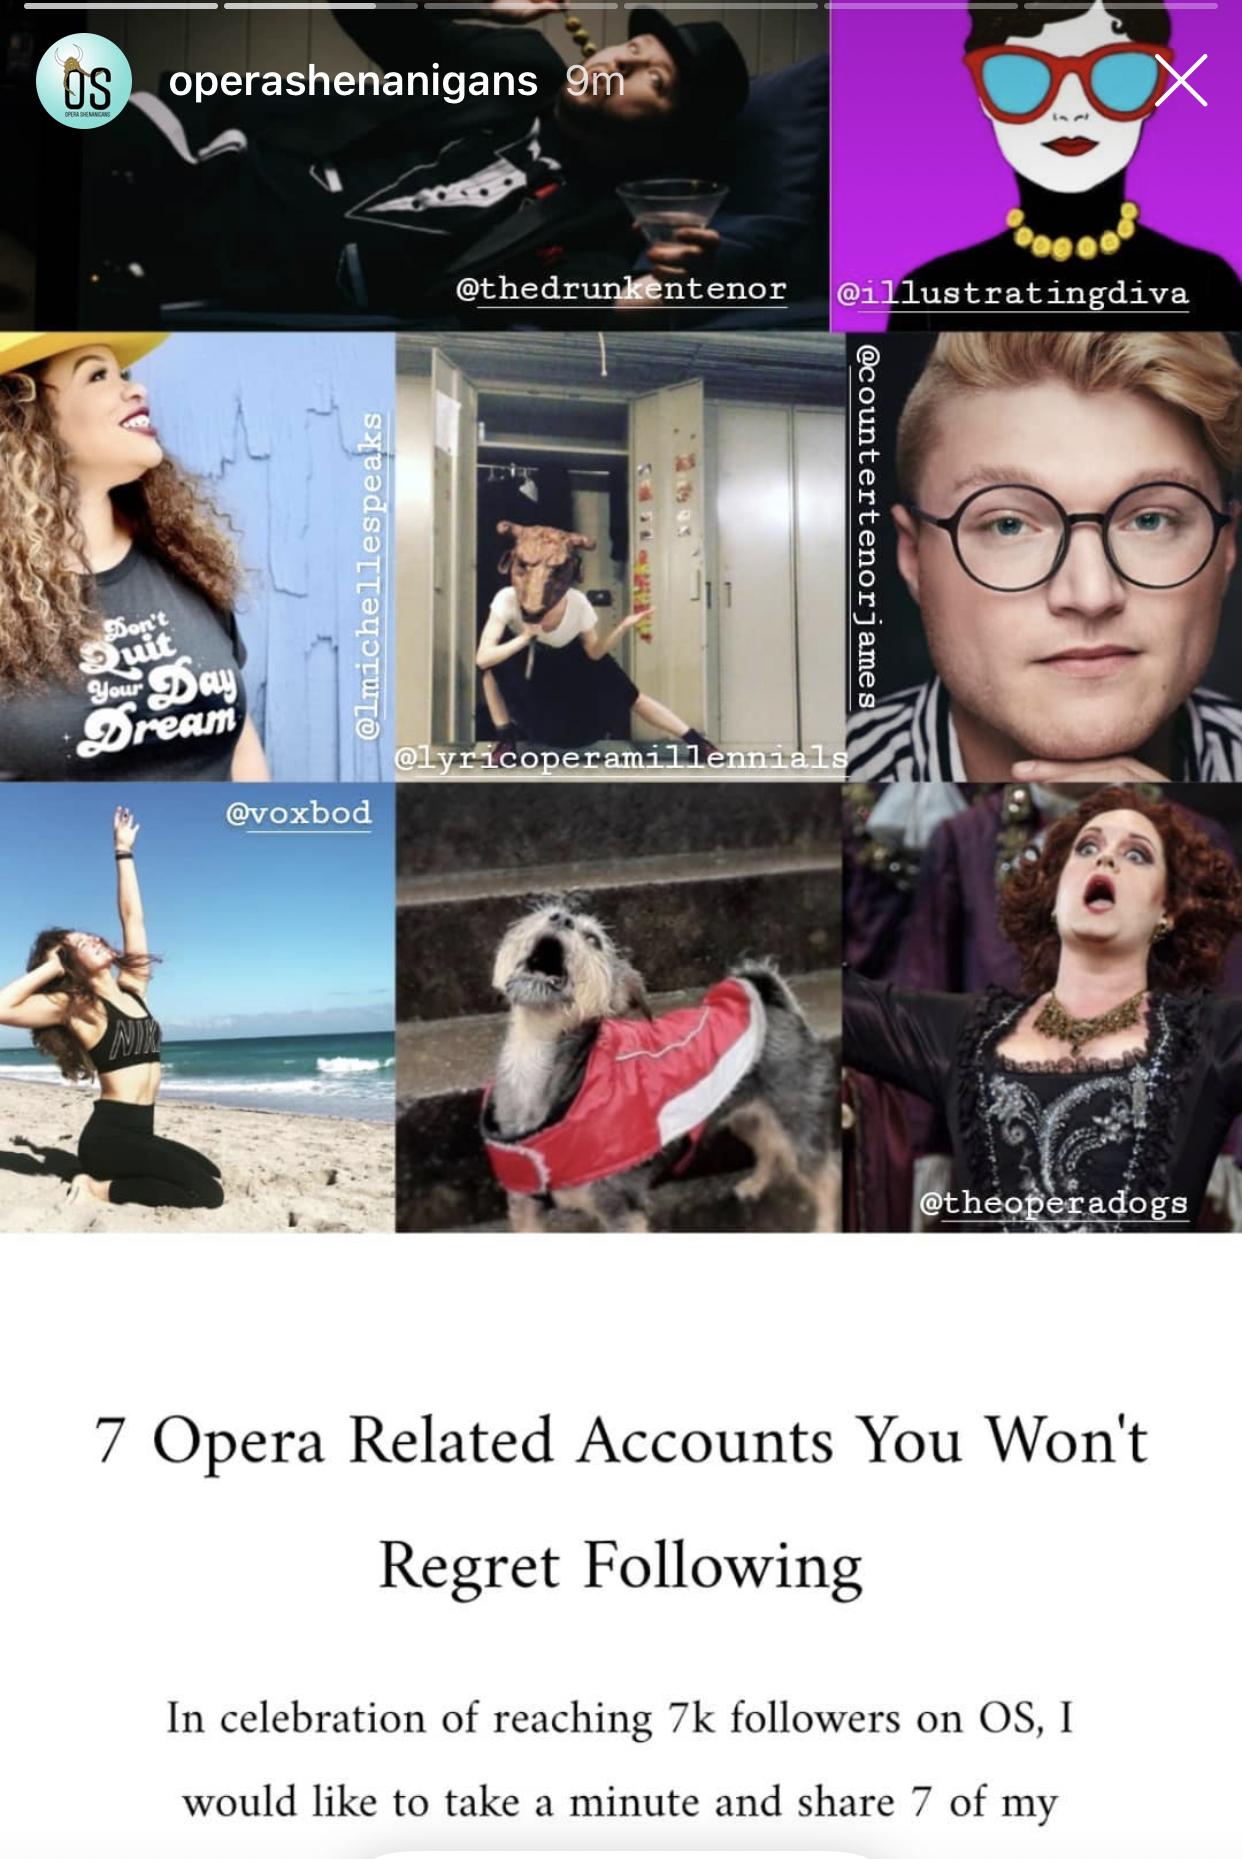 7 Opera Related (IG) Accounts You Won't Regret Following–Opera Shenanigans